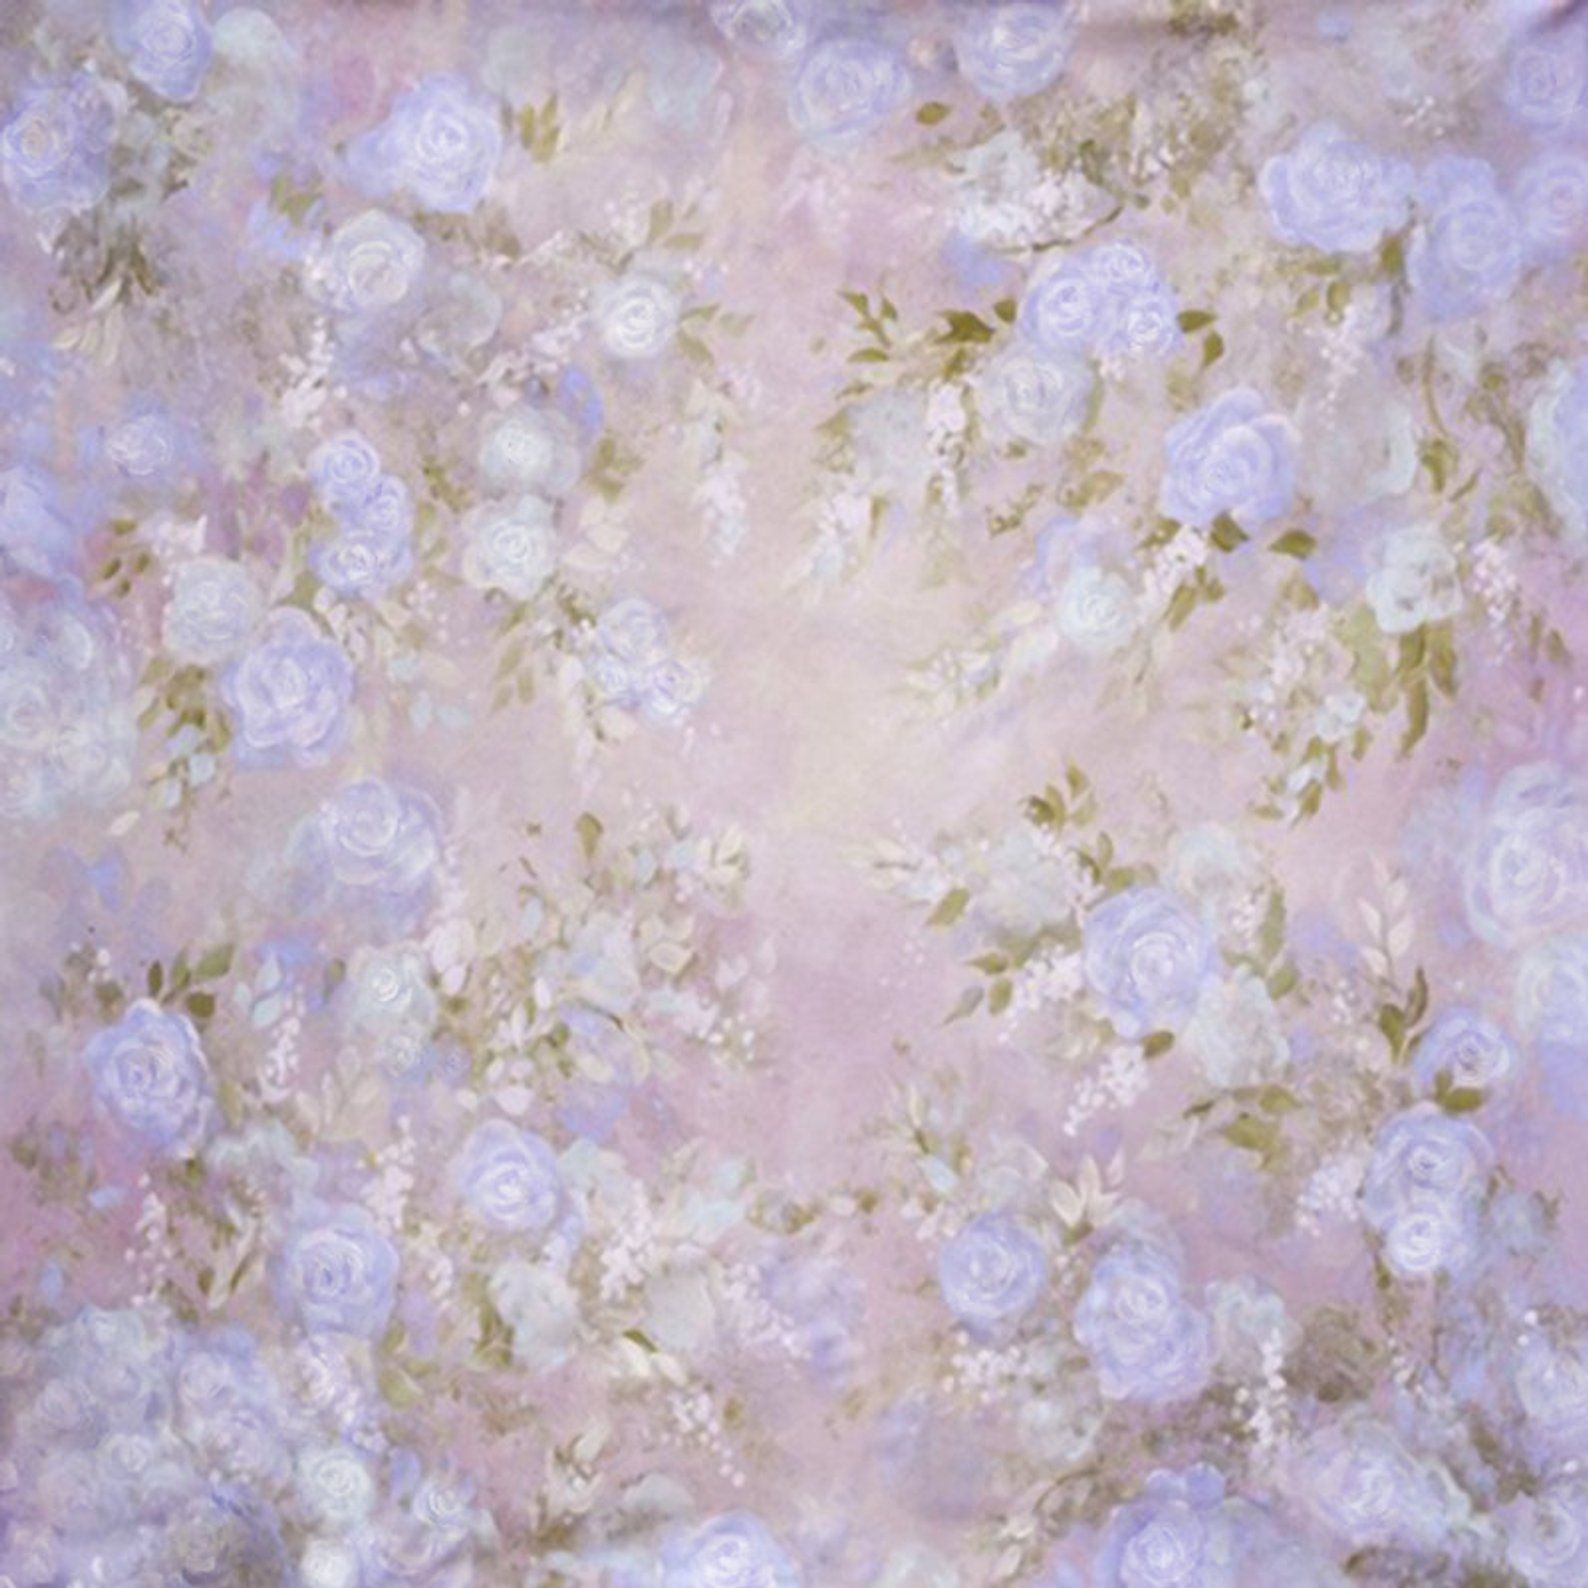 Bokeh Flowers Wedding: Vinyl Spring Wedding Bokeh Oil Paint Flower Photography